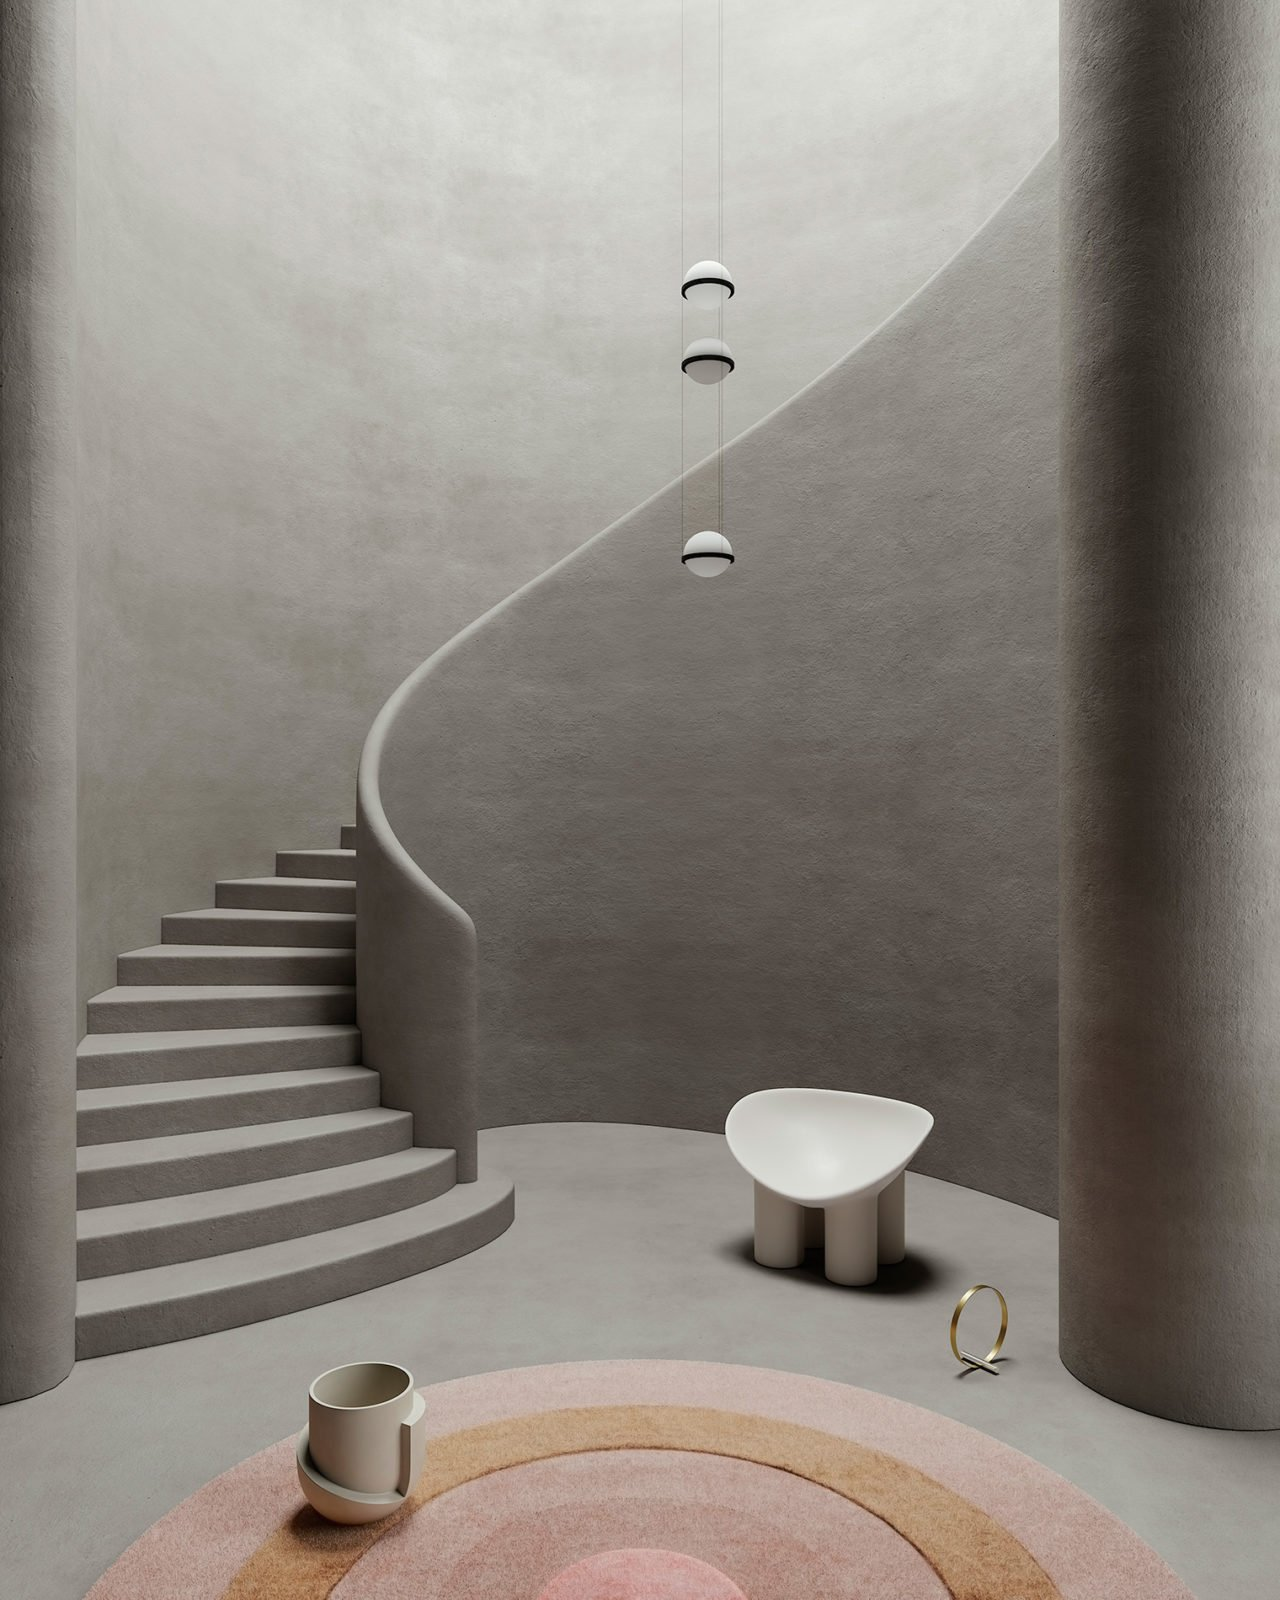 Design set around a staircase, Cristina Lello.